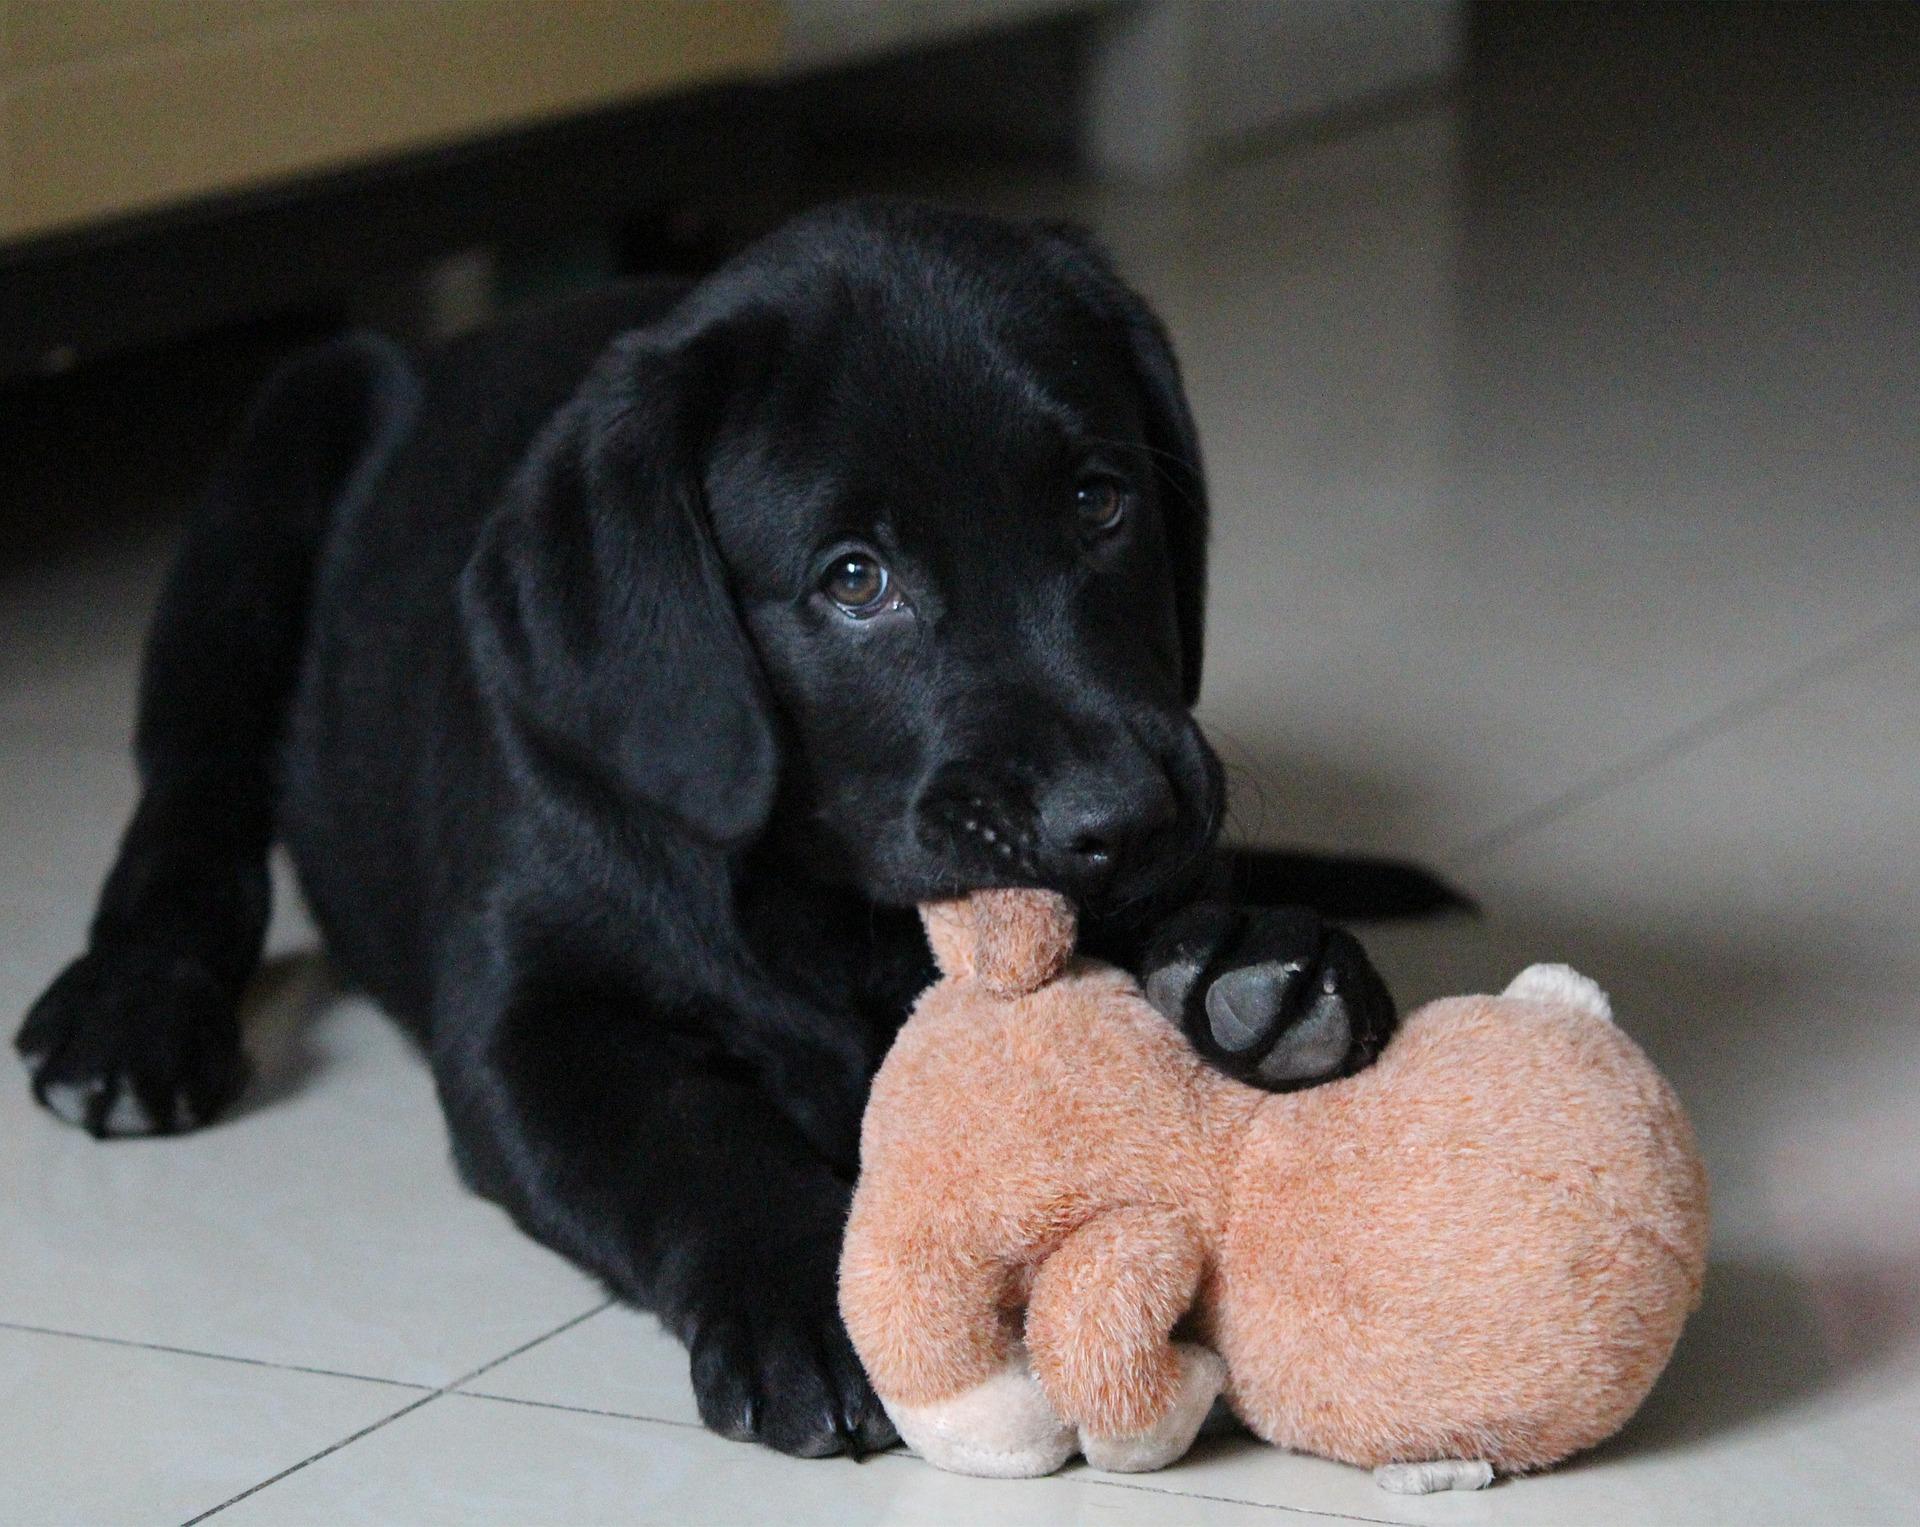 chien Lydia89 / Pixabay